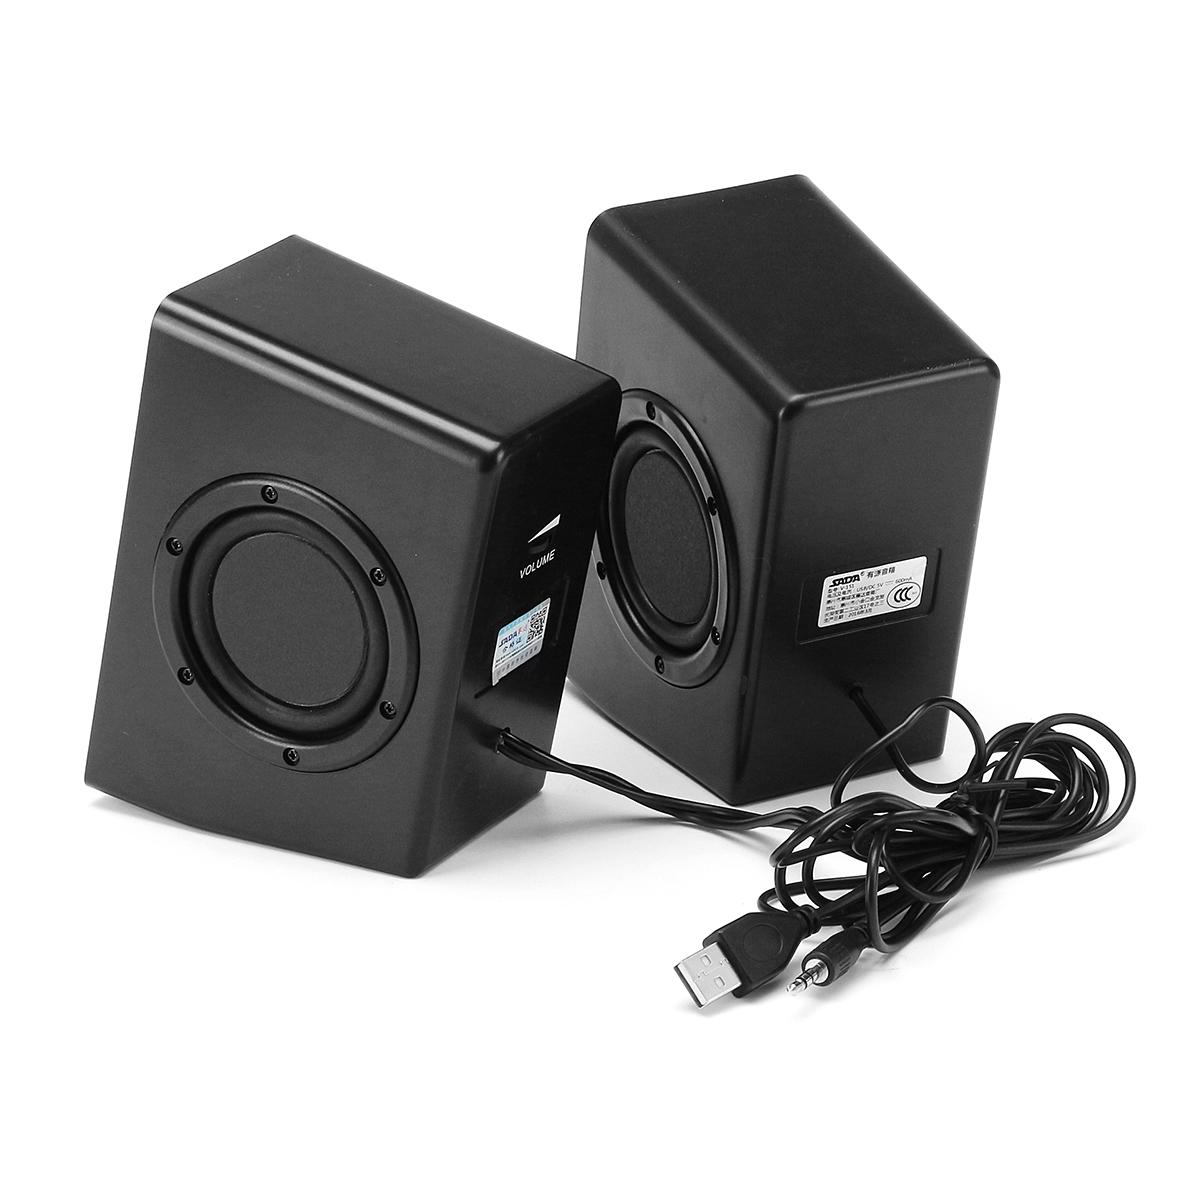 SADA V-15 Computer Speaker 2PCS Portable Wired Speakers Stereo Bass Home Soundbar